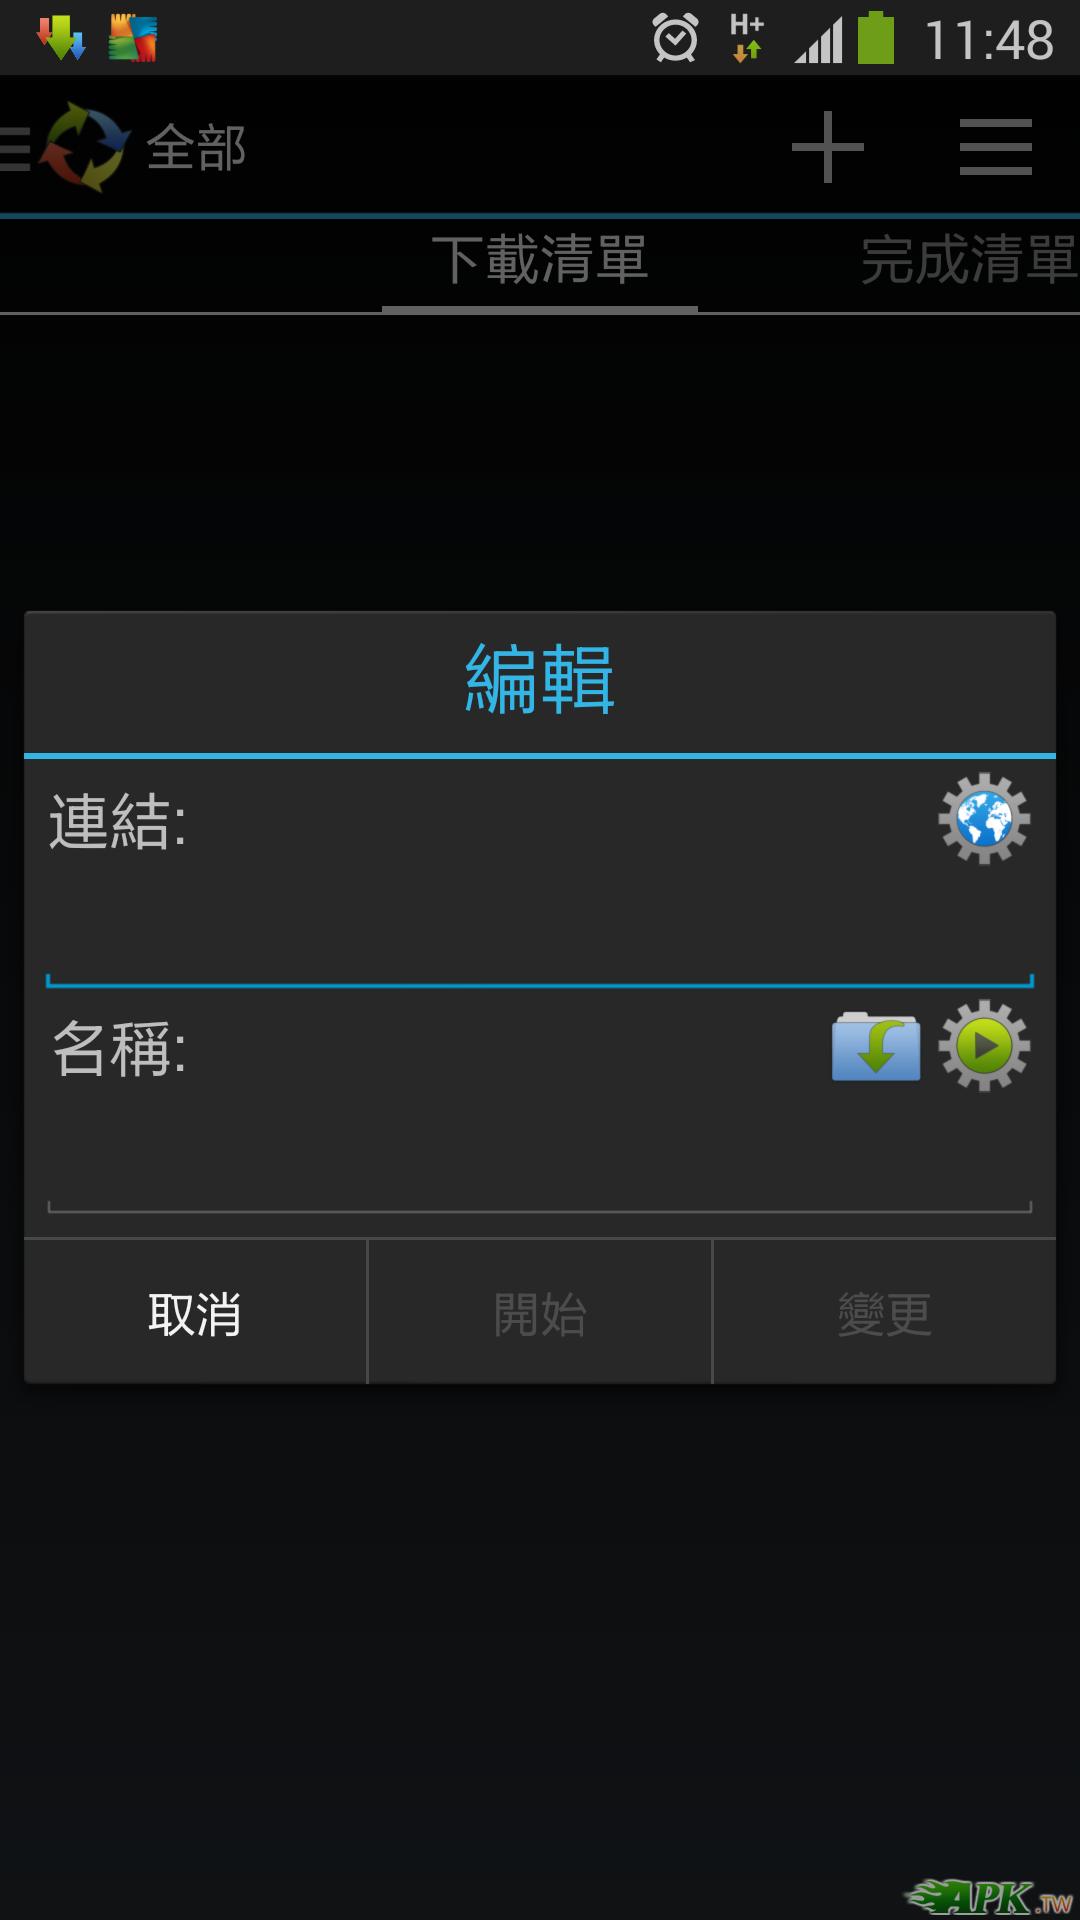 Screenshot_2014-06-19-11-48-46.png